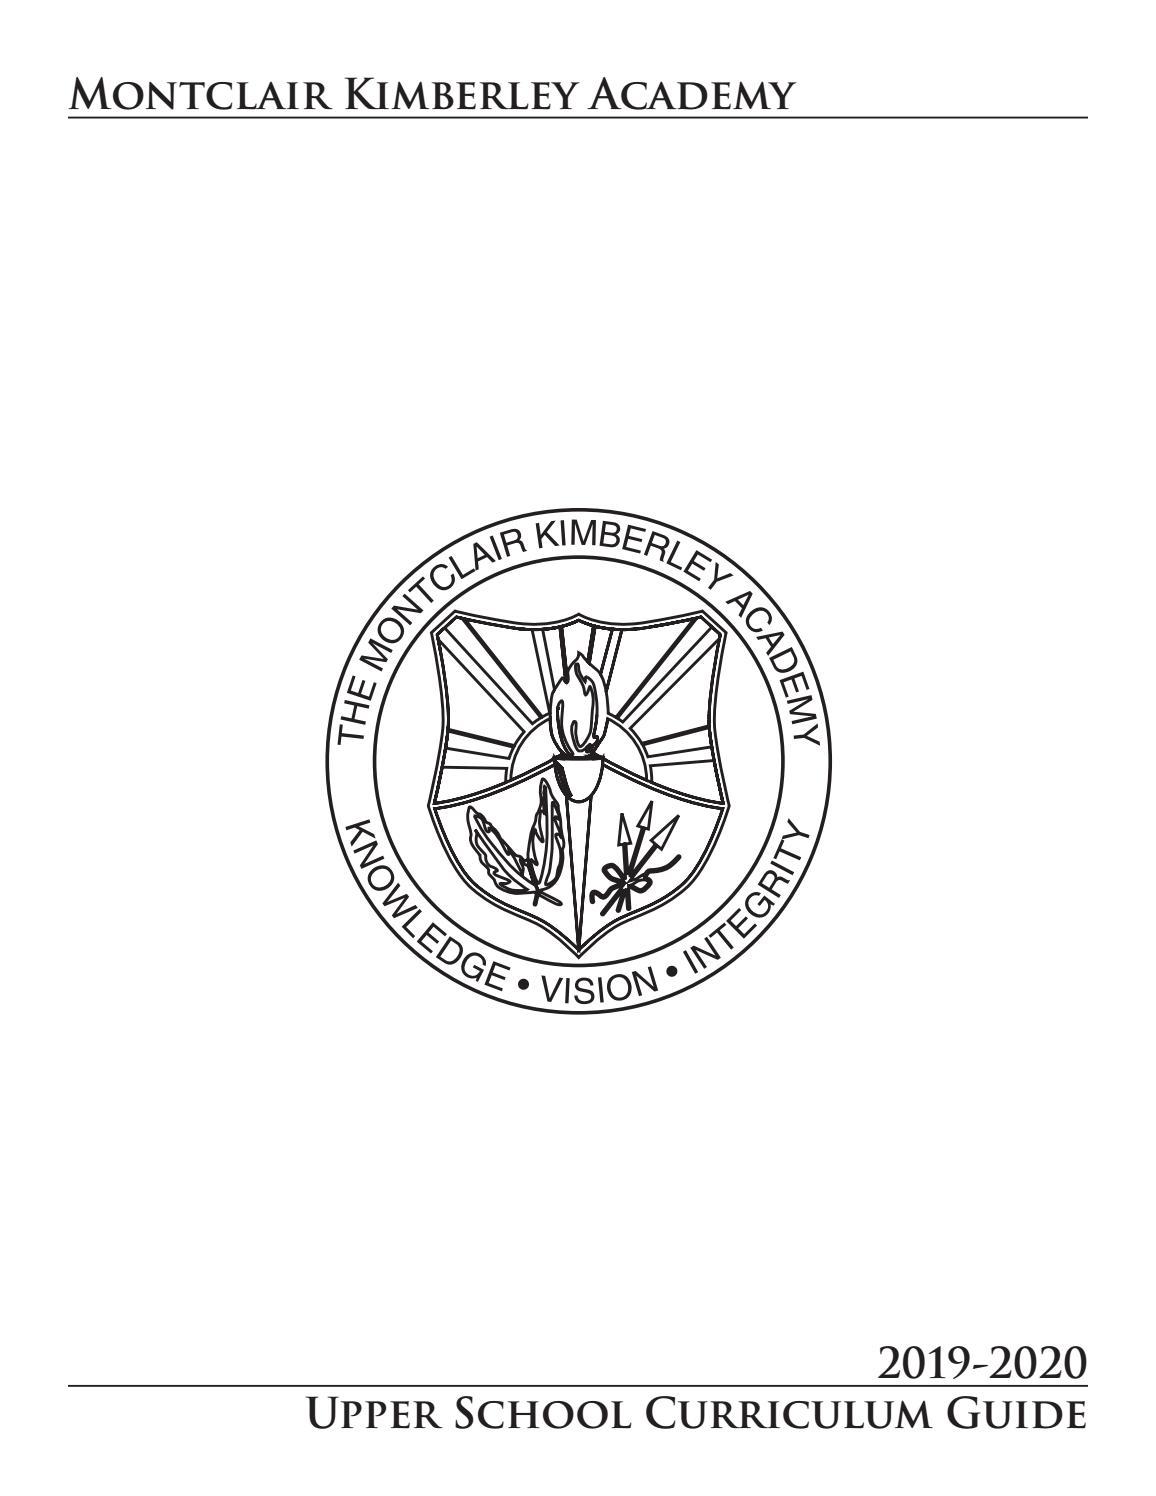 Upper School Curriculum Guide 2019-2020 by Montclair Kimberley